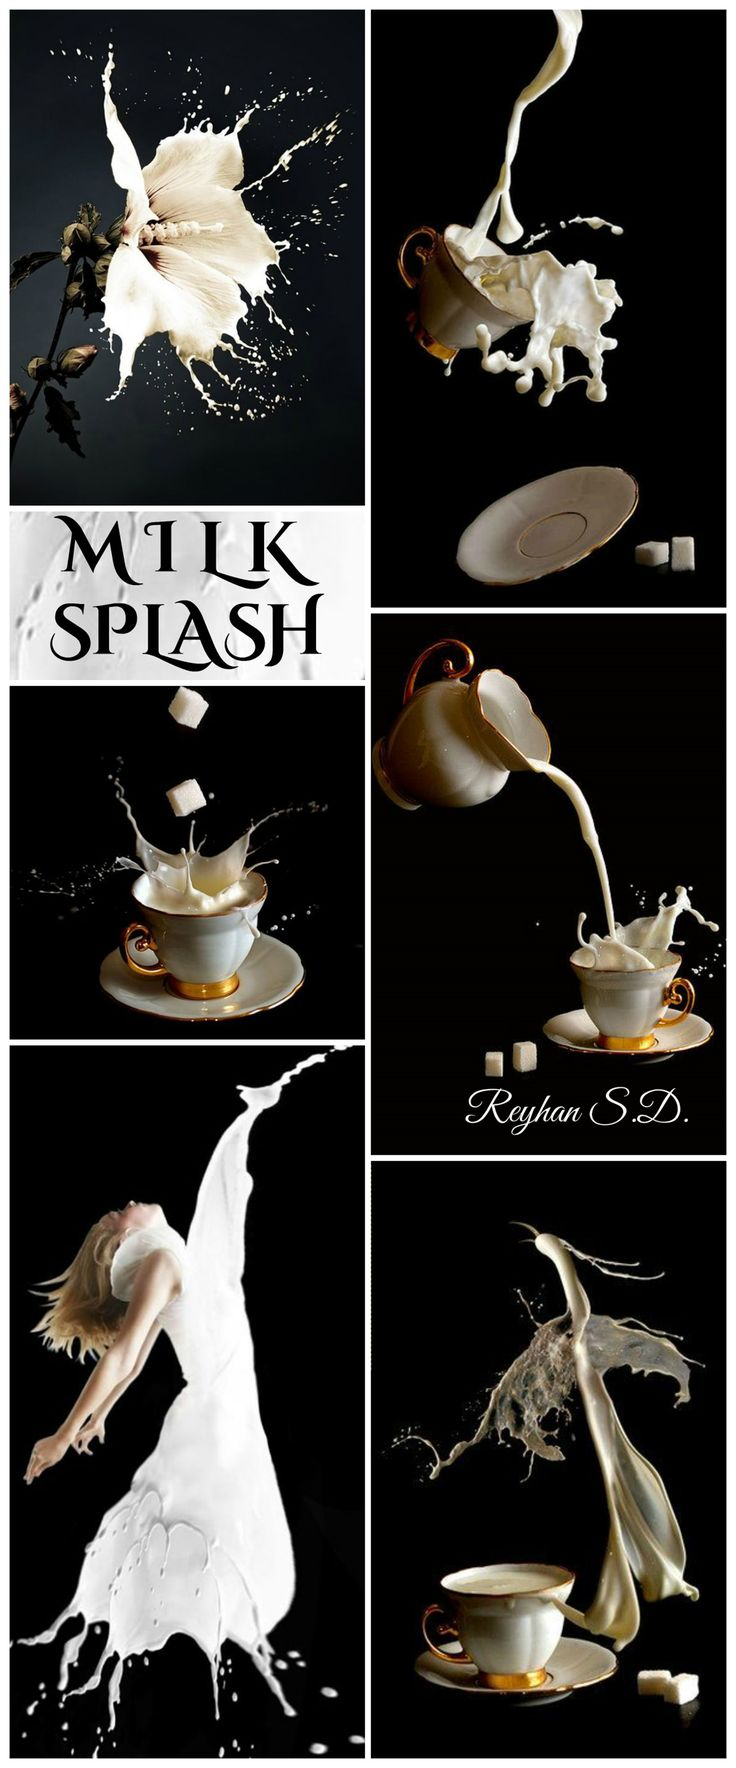 '' Milk Splash '' by Reyhan S.D.